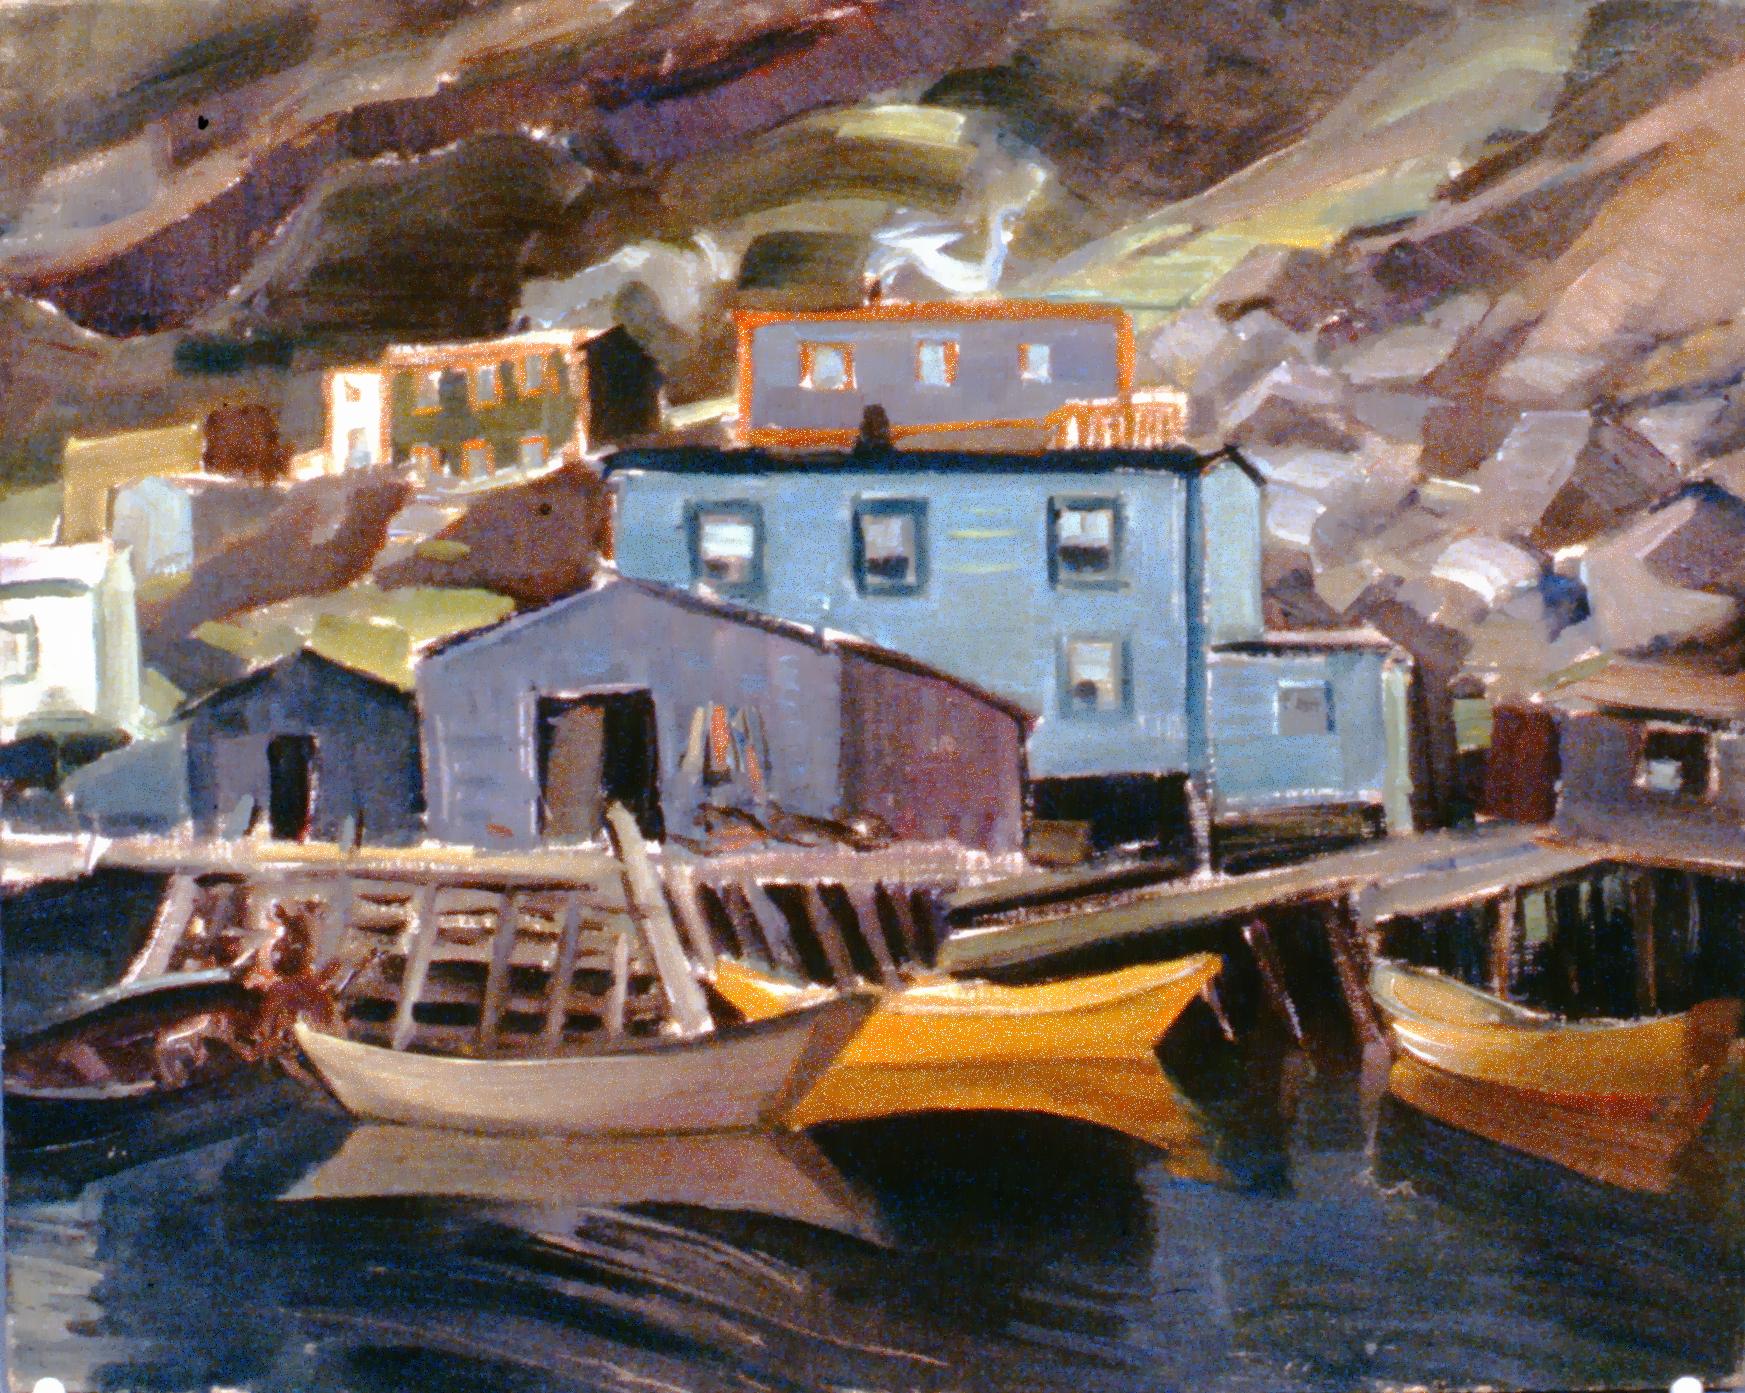 Boats, Francois, Newfoundland, 1953